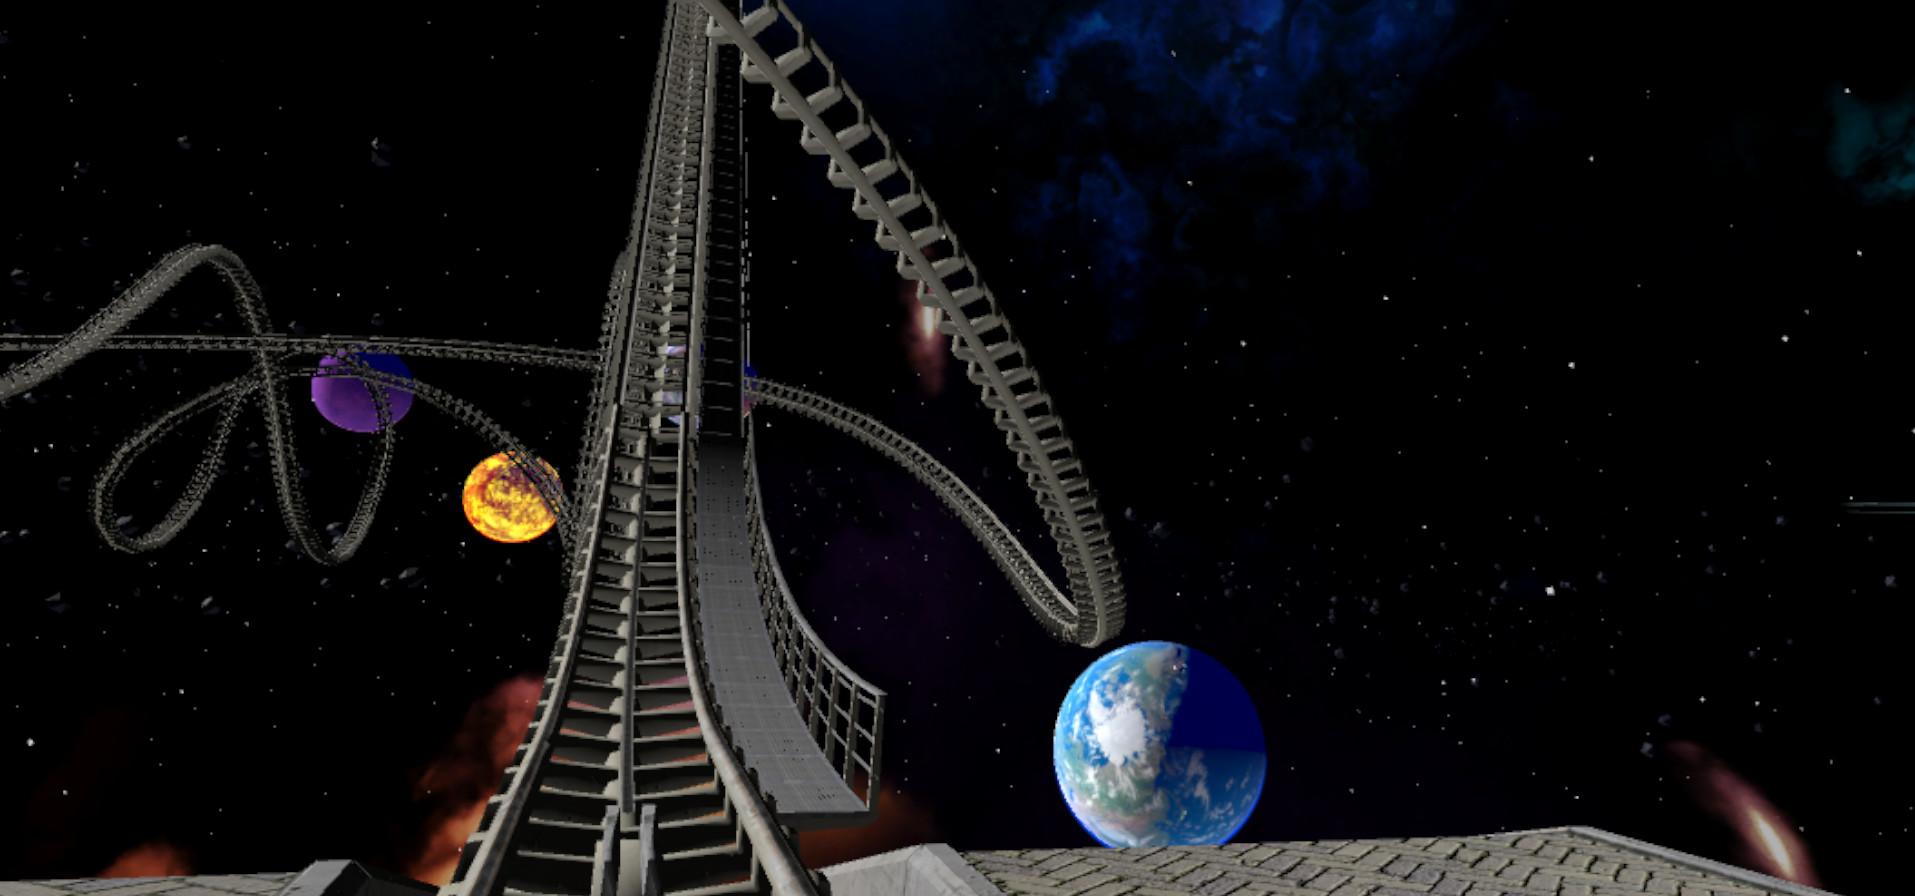 VR Galactic Roller Coaster screenshot